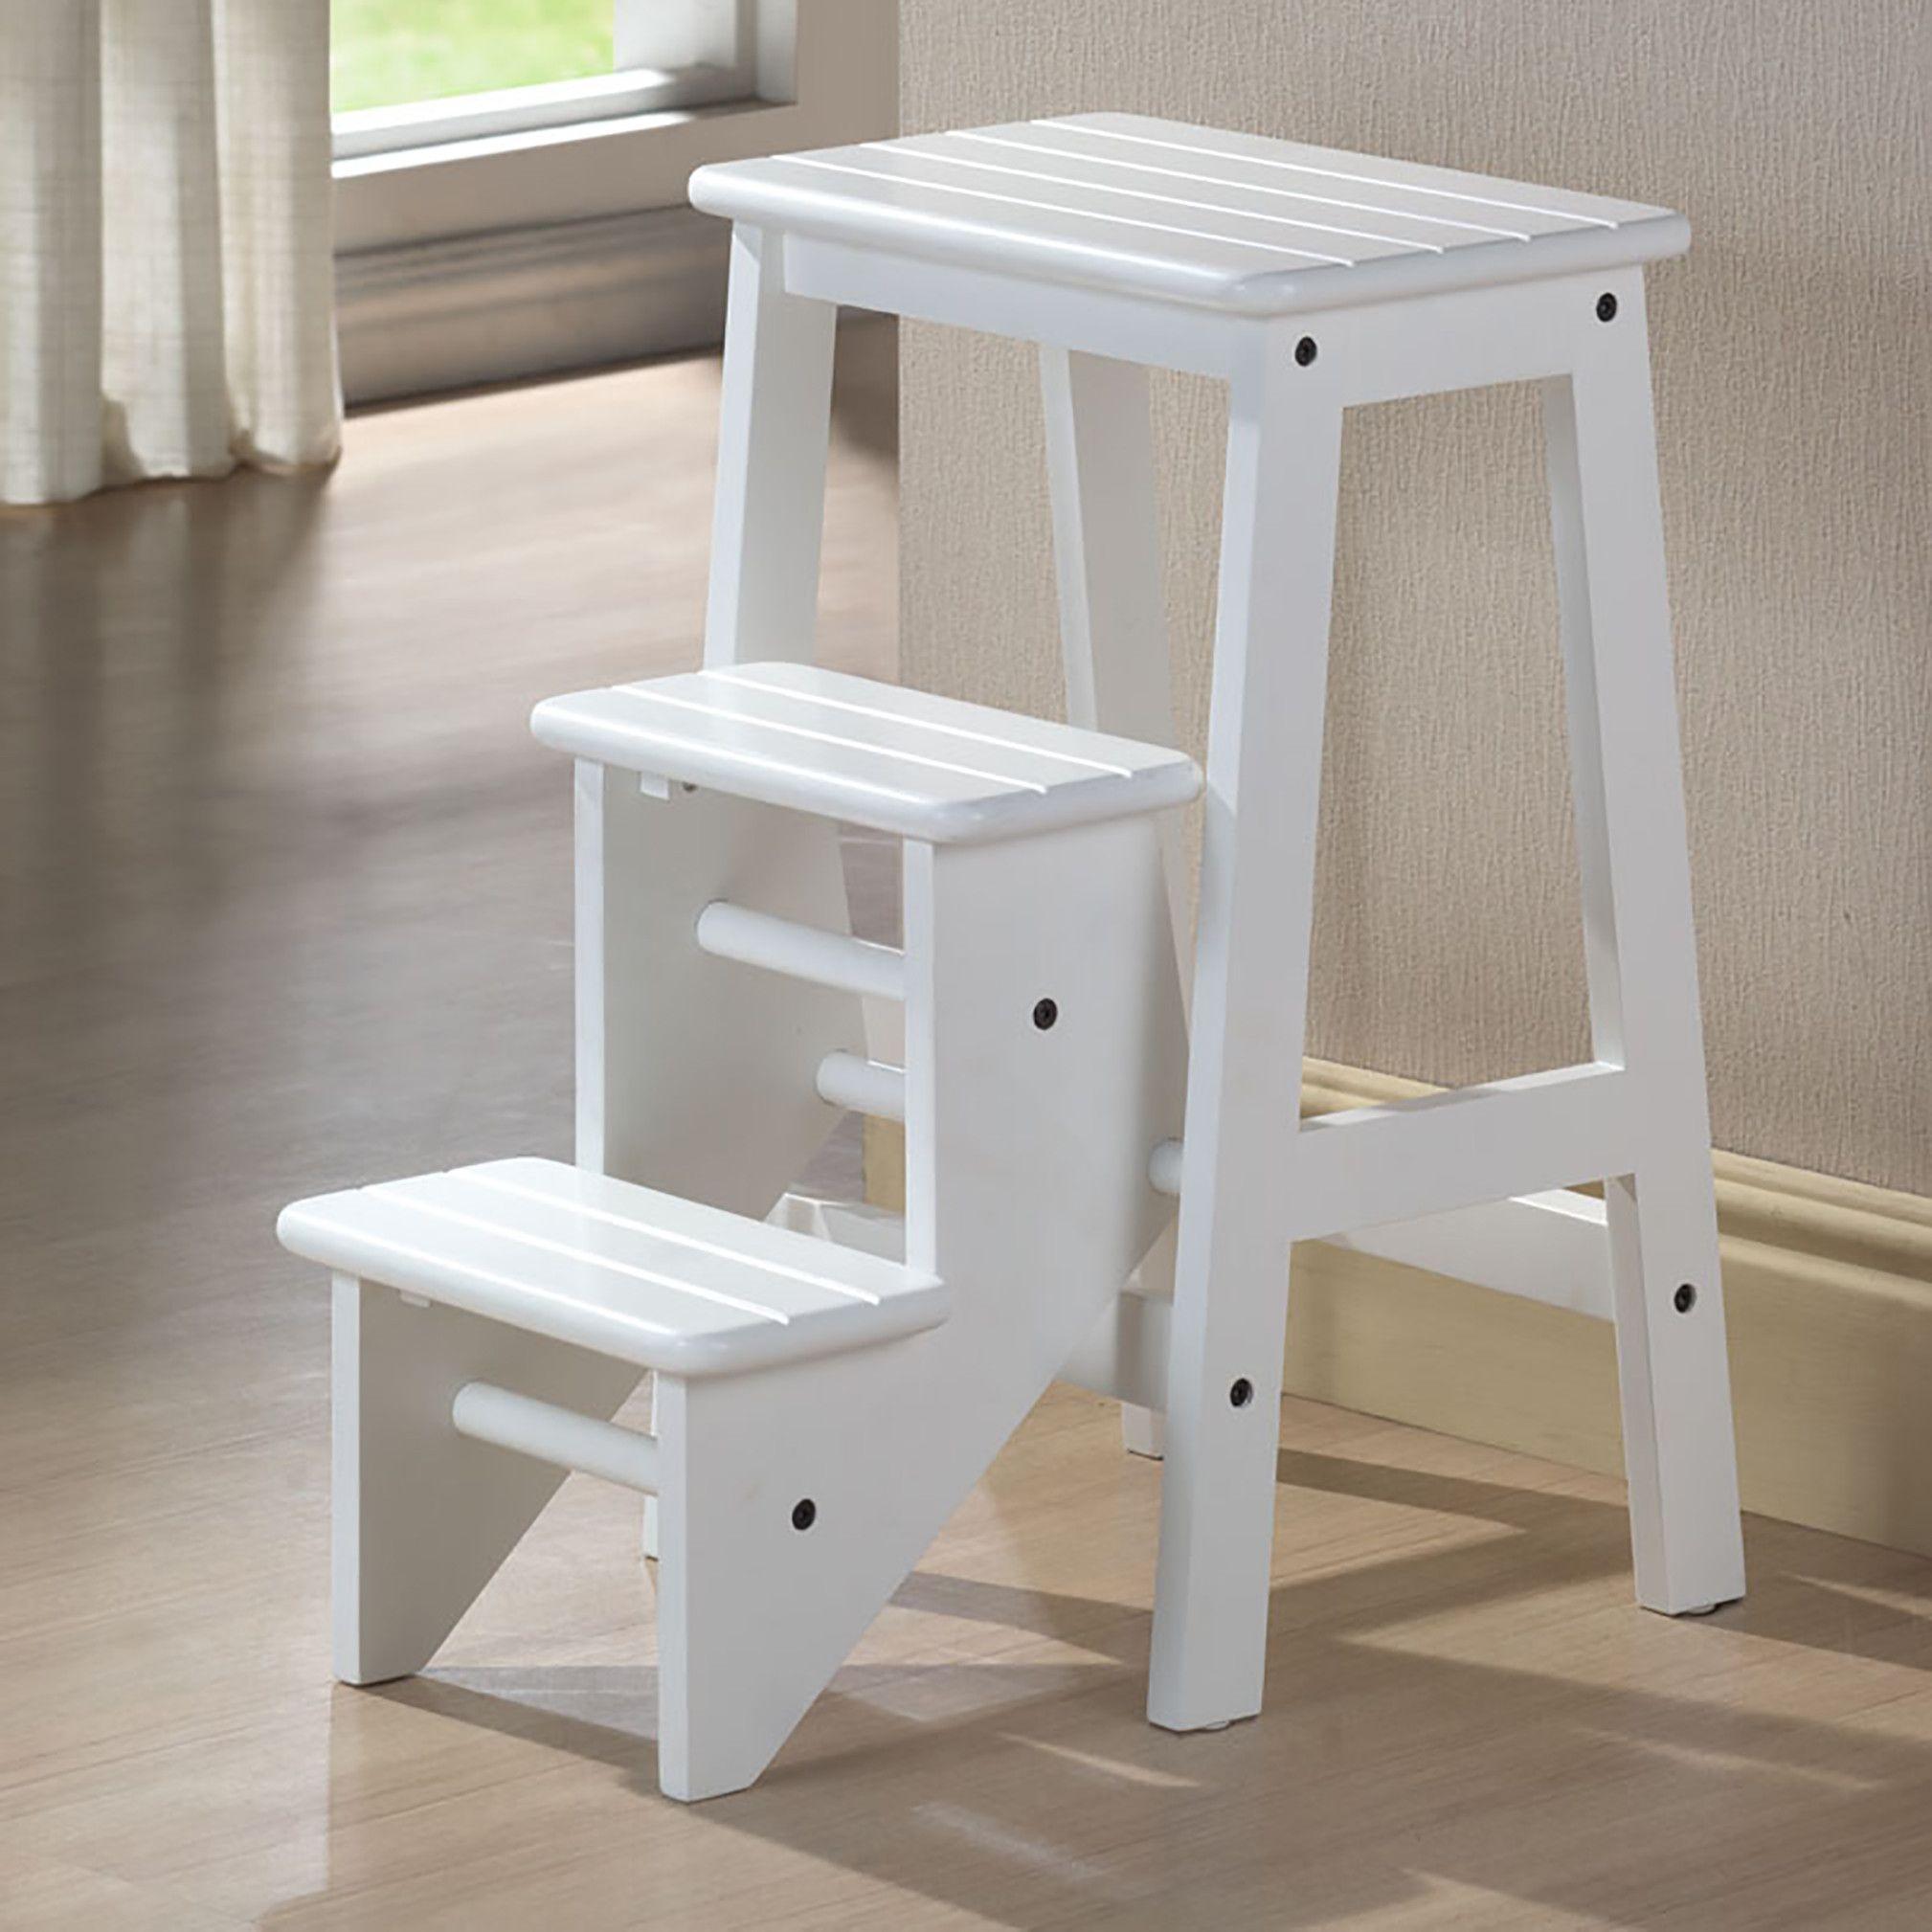 Beau Bailey Step Stool Ballard Designs. Home Kitchen Furniture. Decorative ...